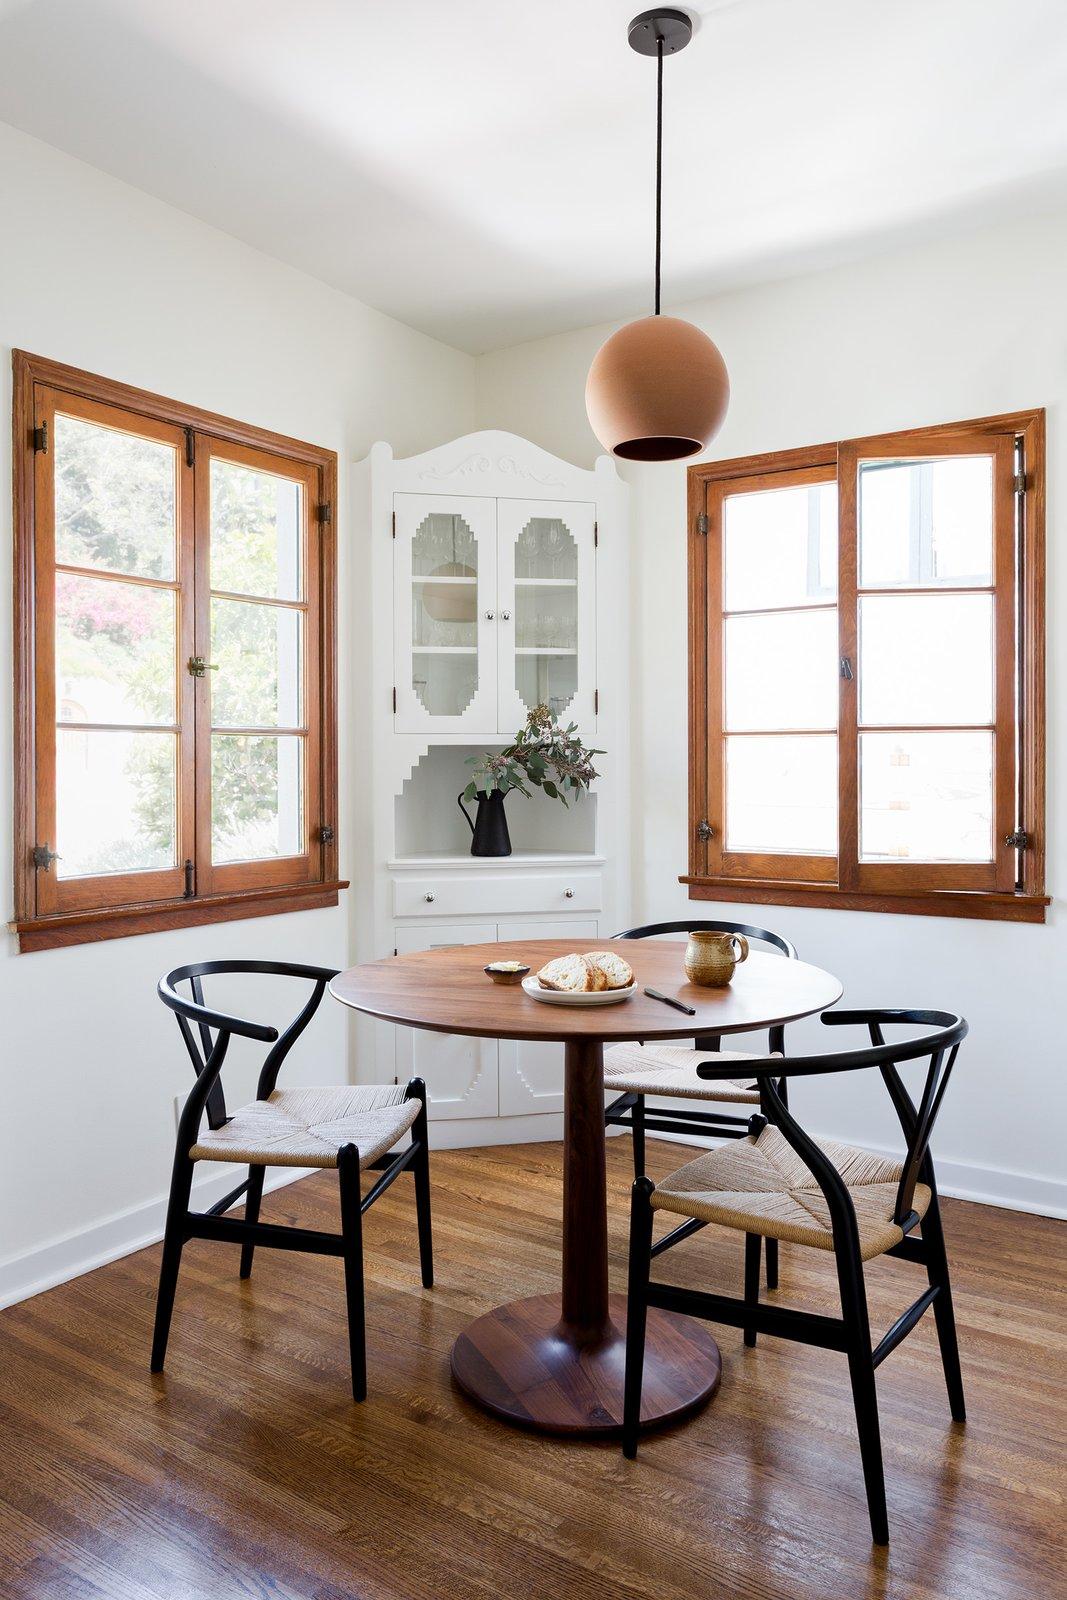 Dining Room, Table, Storage, Medium Hardwood Floor, Pendant Lighting, and Chair Breakfast Nook  Dundee Residence by Jette Creative